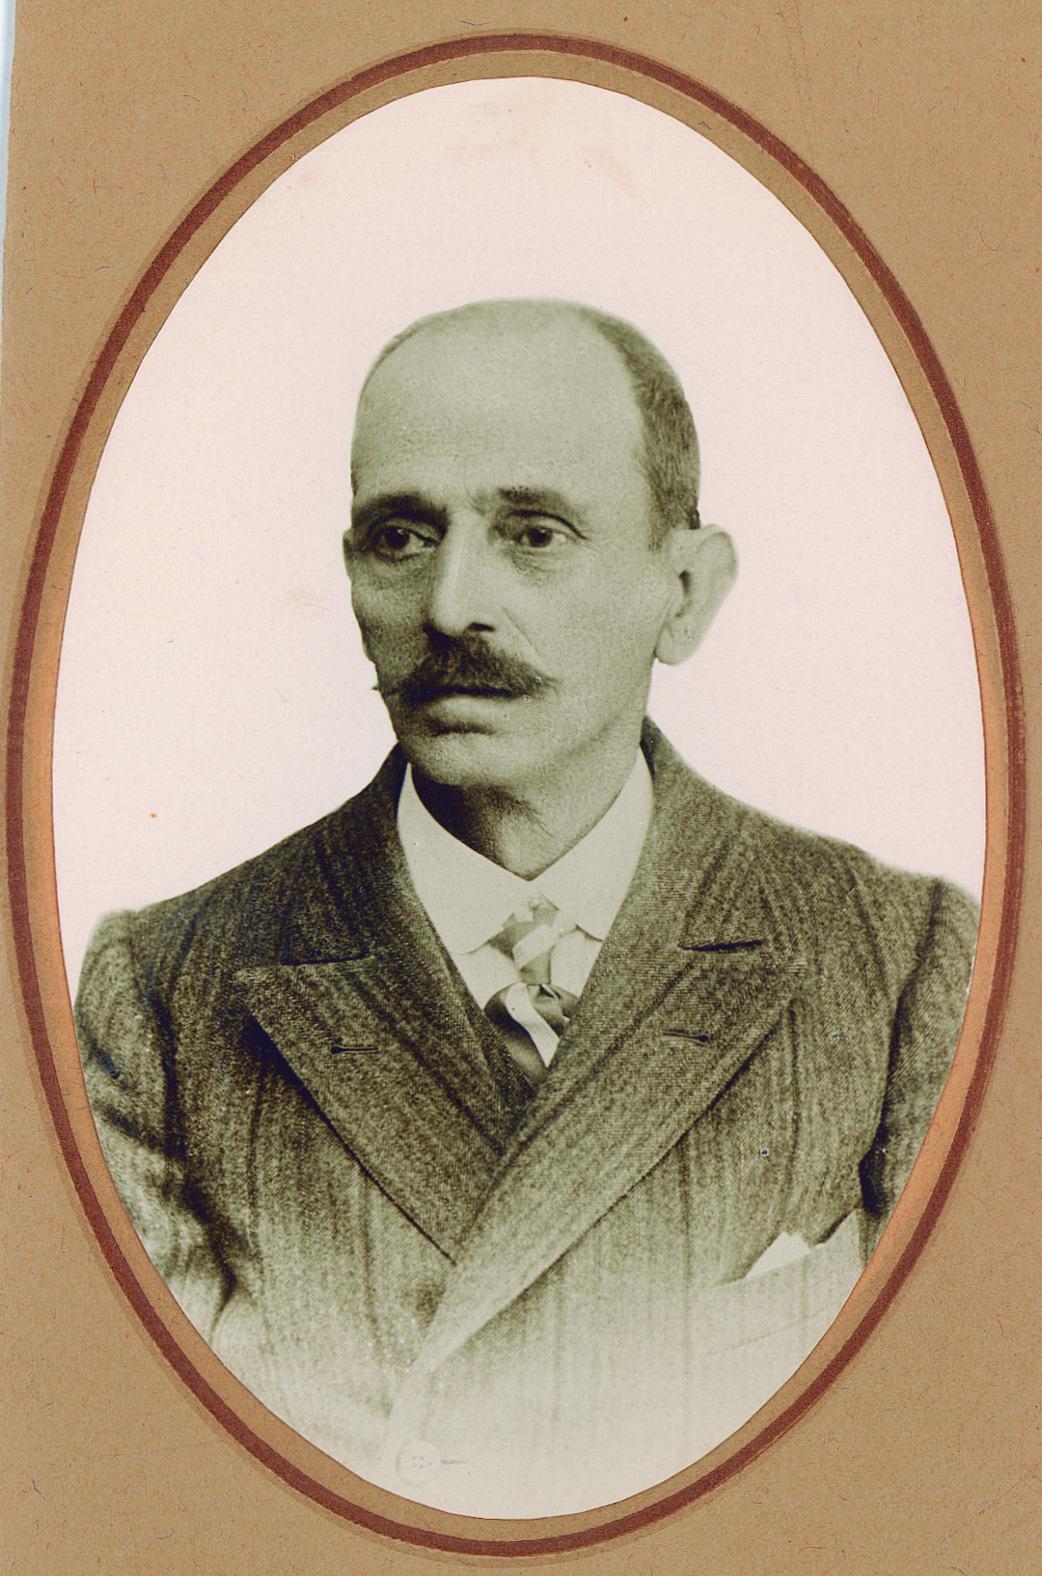 08.04.16 ALCALDE DE MANI- SES: JOSÉ GÓMEZ DEVÍS 1894